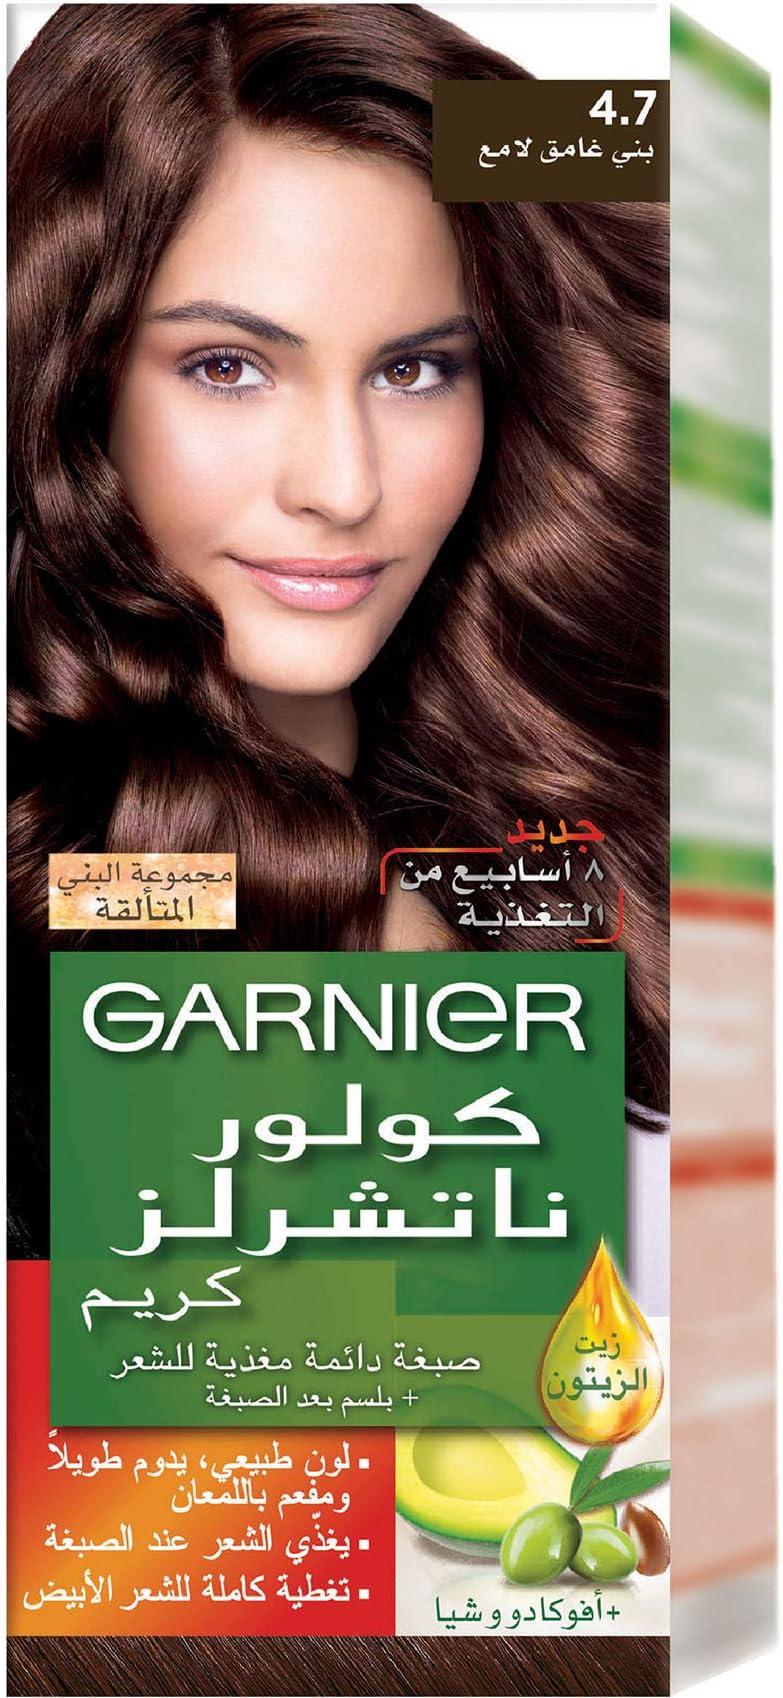 Garnier Color Naturals 4 7 Shiny Dark Brown Haircolor Sparkle Browns Shade Price In Uae Amazon Uae Kanbkam